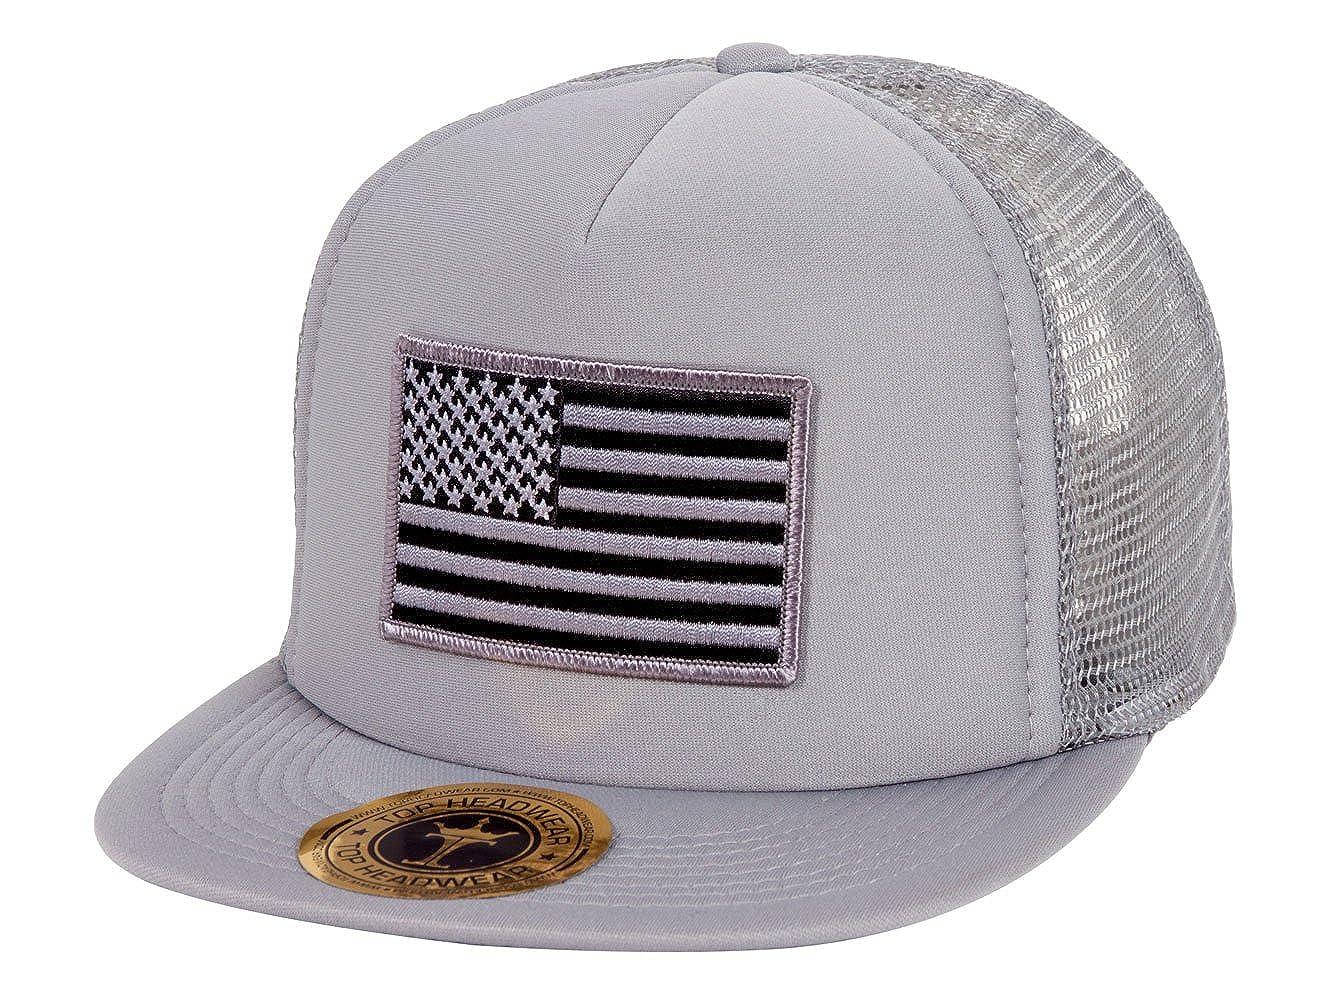 6081b4c9e011df TOP HEADWEAR USA Flag Flat Bill Trucker Mesh Hat - Grey at Amazon Men's  Clothing store: